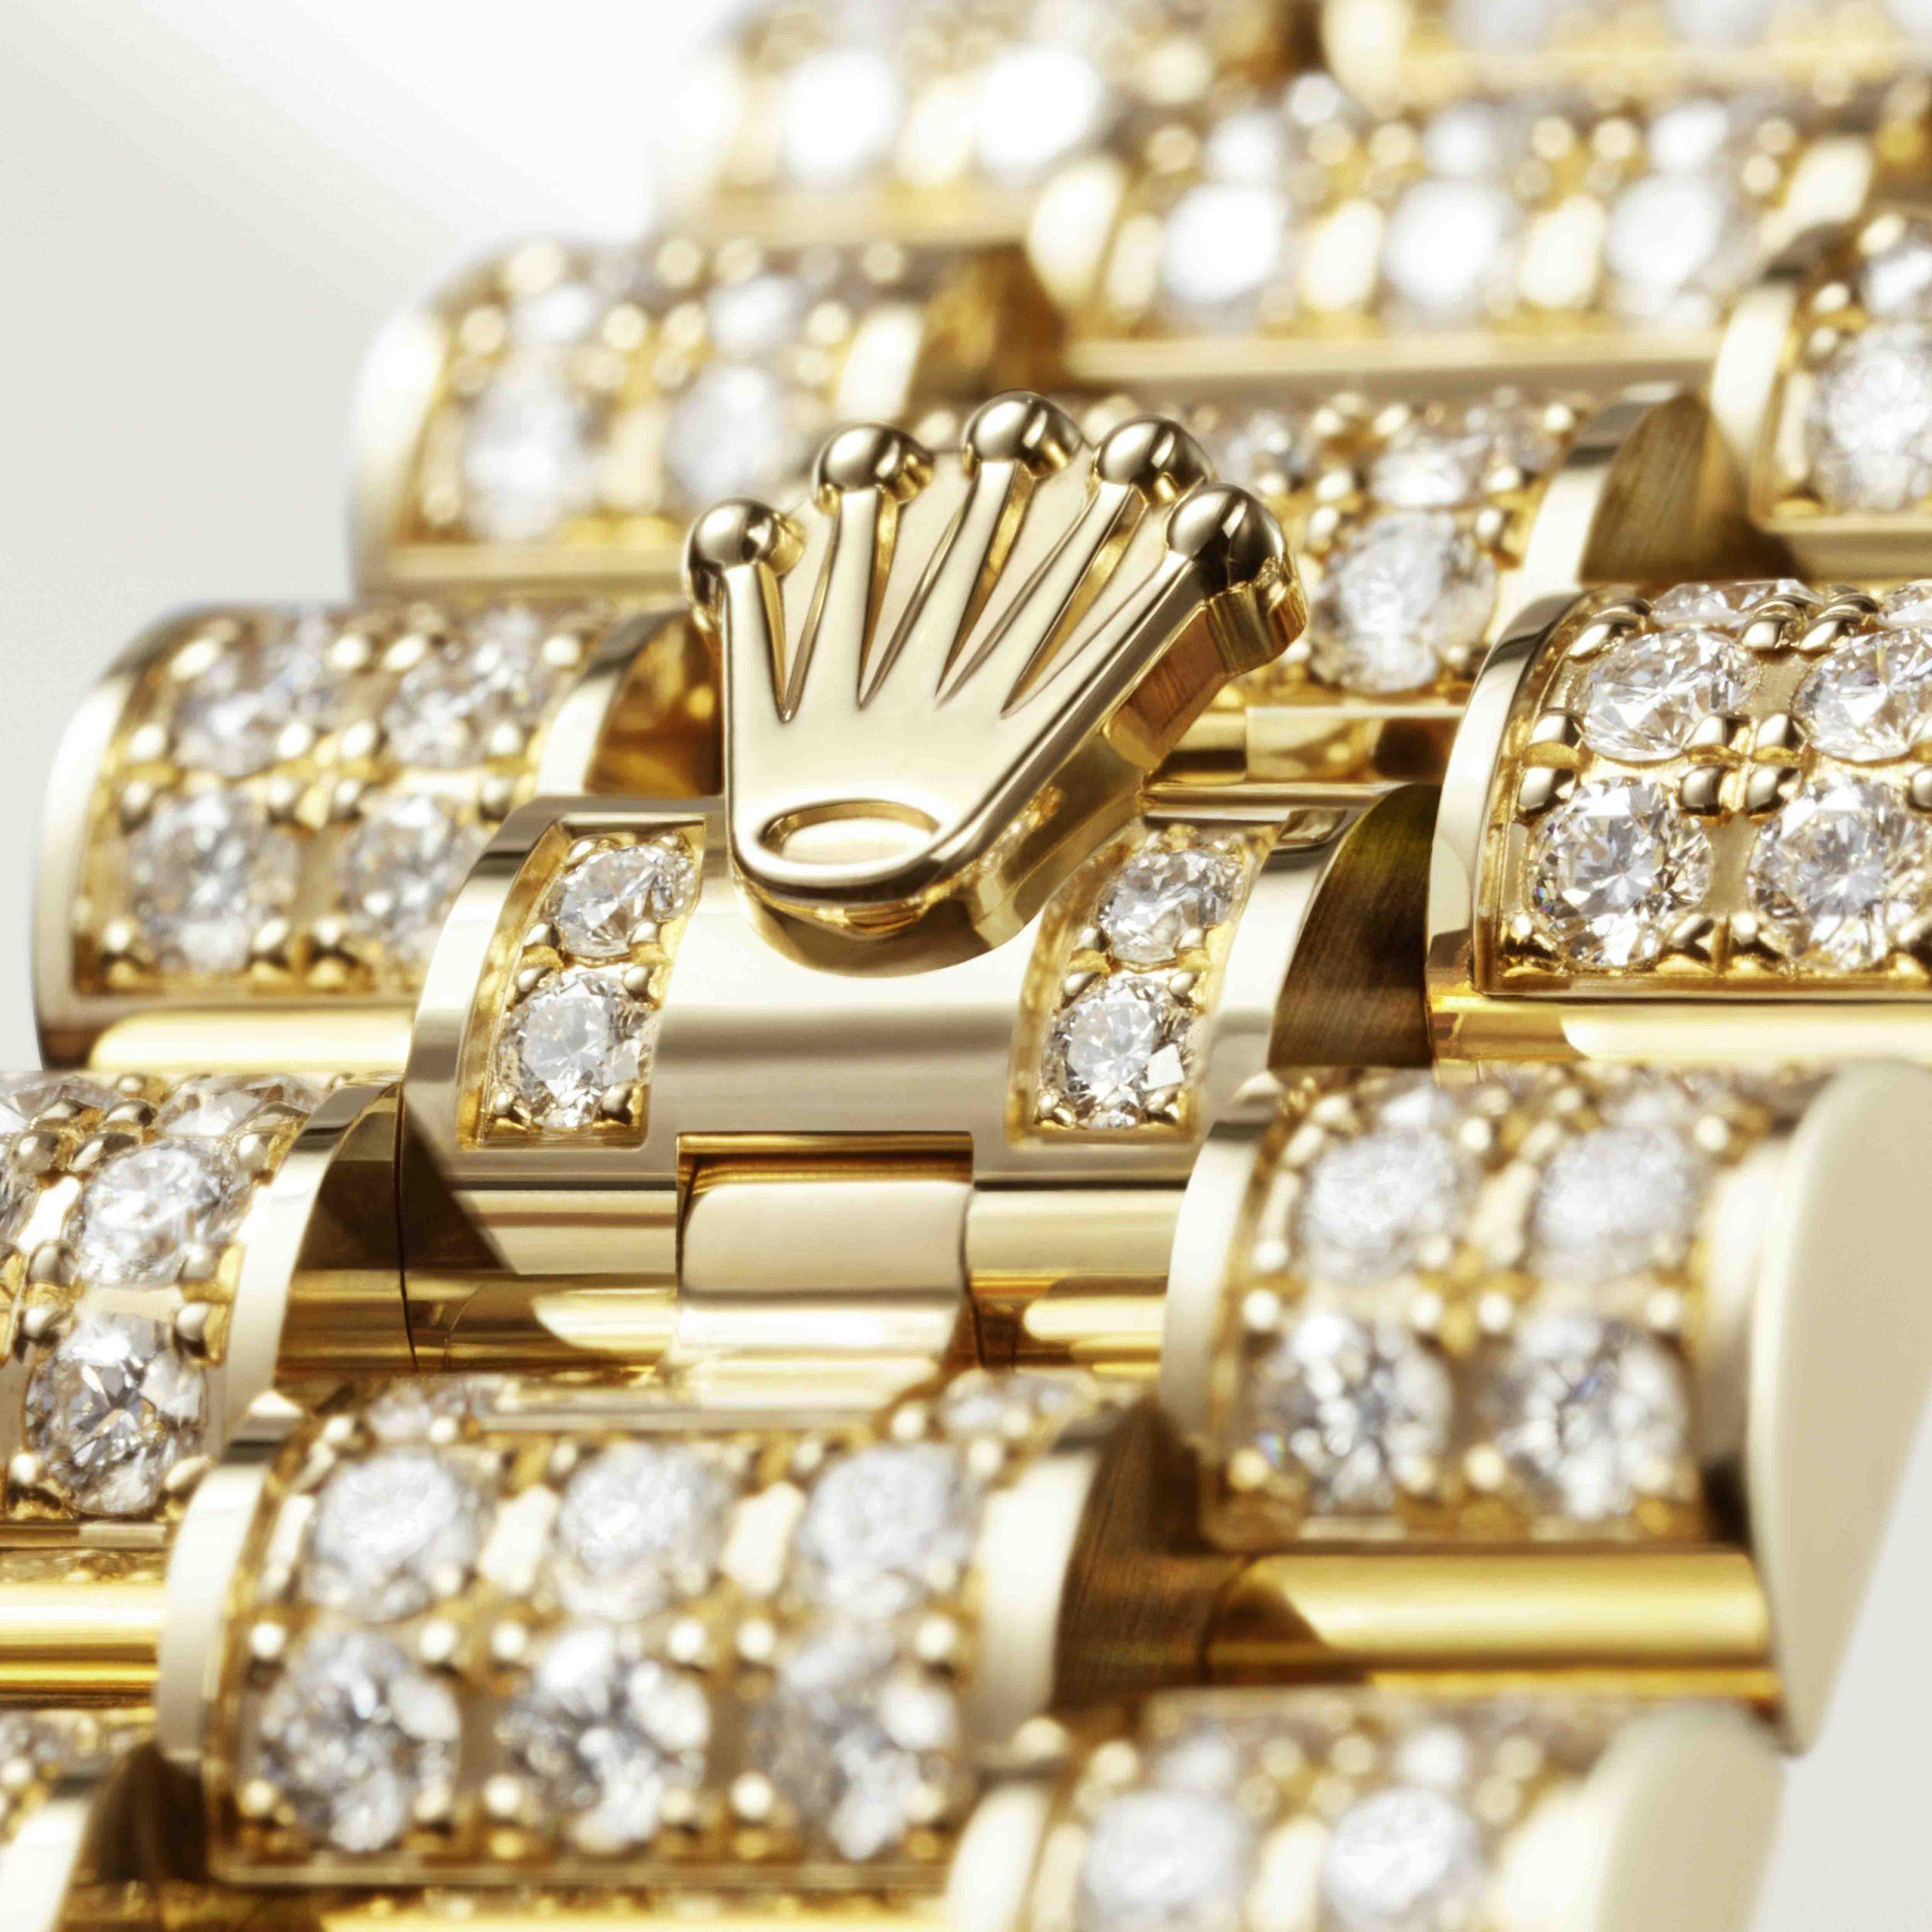 khóa gập của đồng hồ Rolex Oyster Perpetual Lady-Datejust